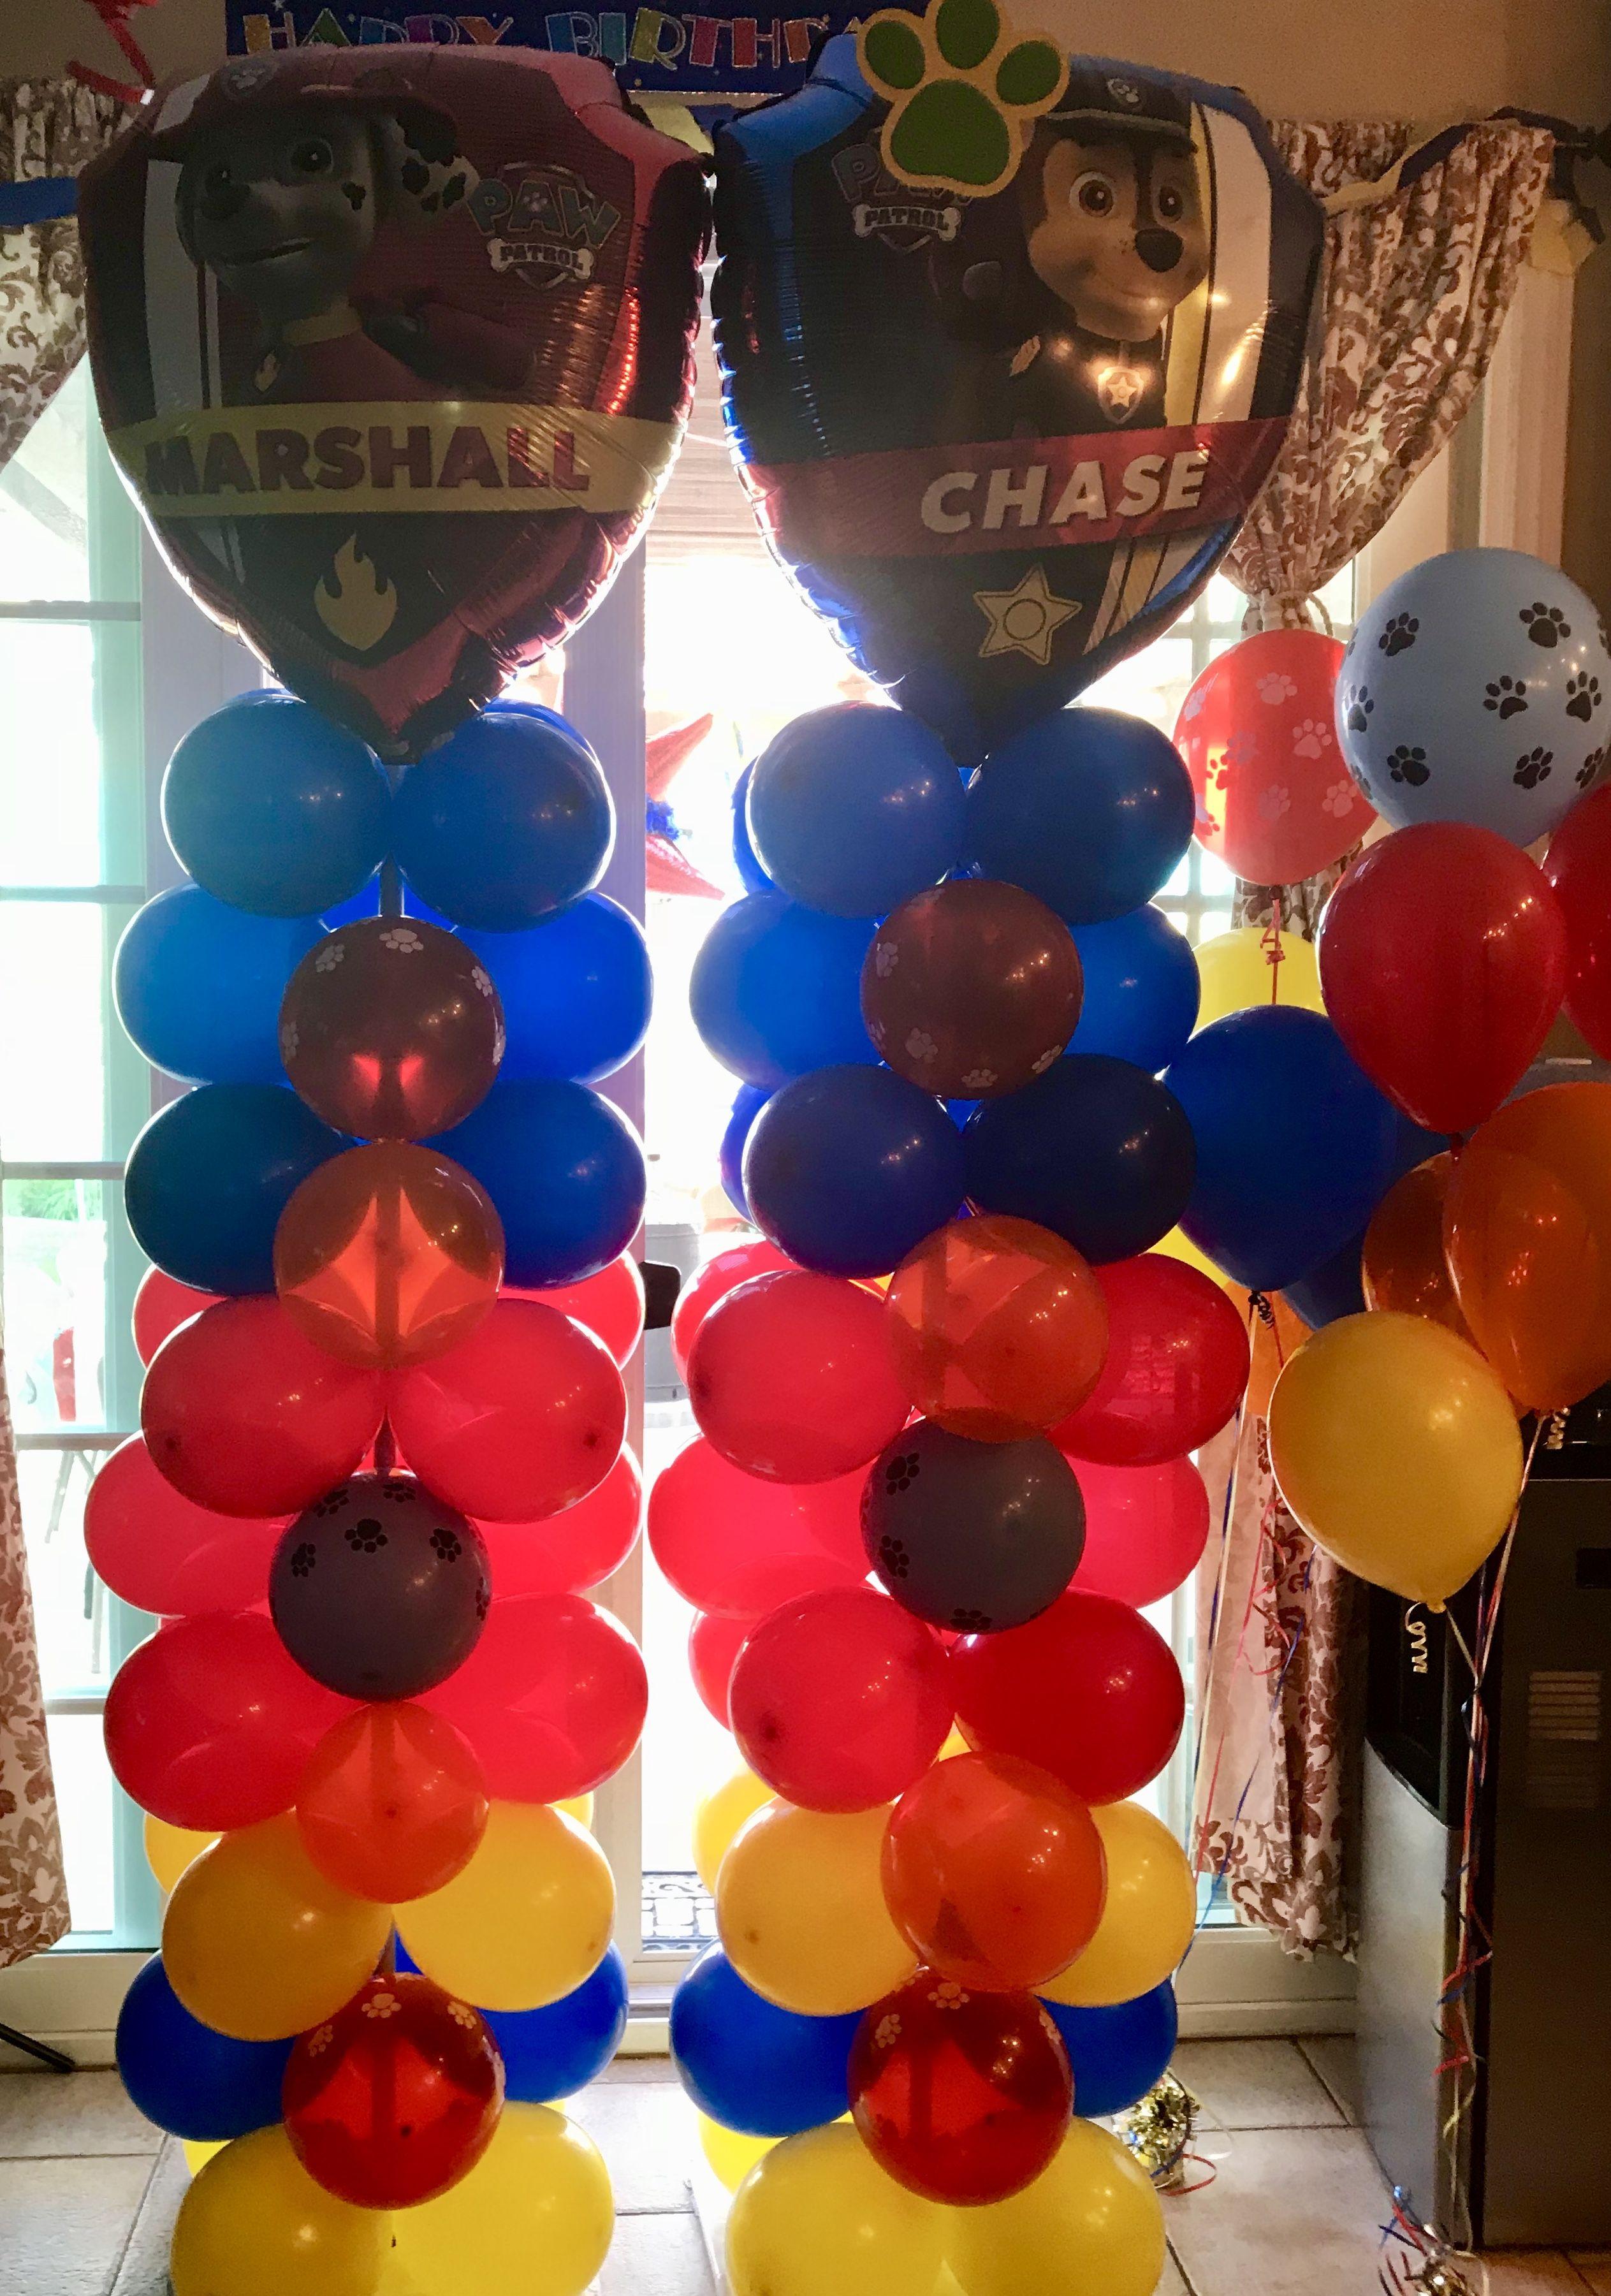 Paw Patrol Balloon Columns Pillars Paw Patrol Party Ideas Paw Patrol Balloons Paw Patrol Birthday Party Paw Patrol Party